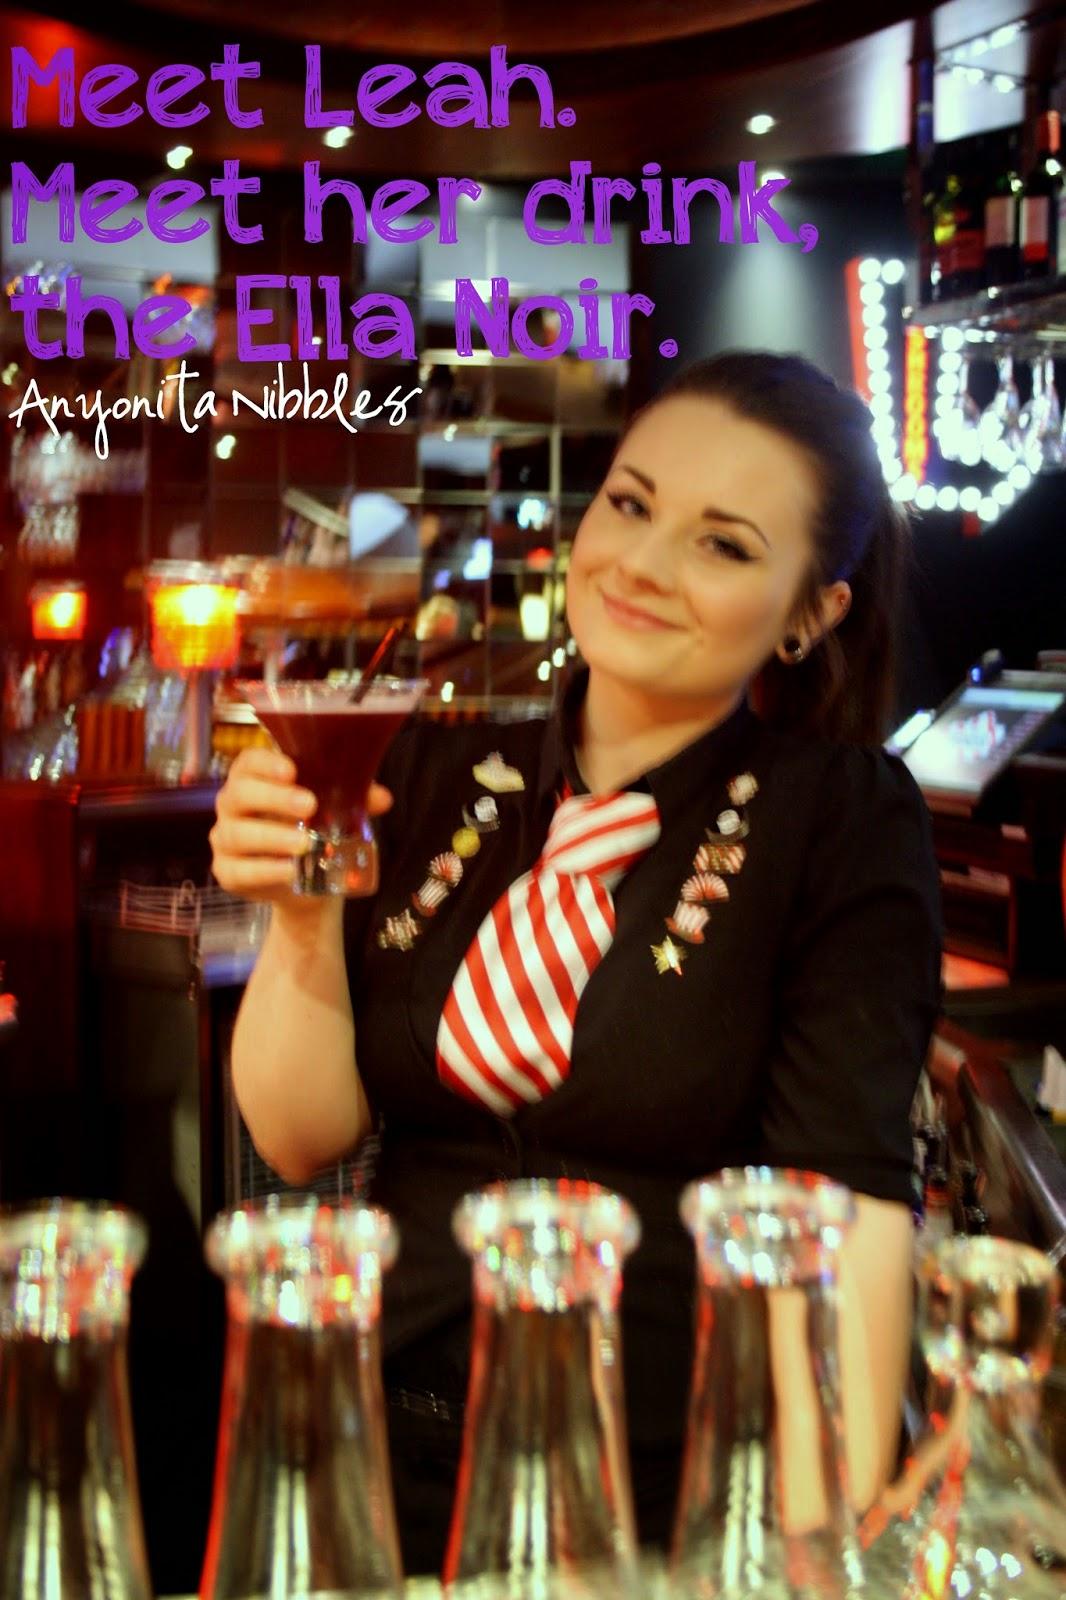 Leah, the creator of Manchester's exclusive Ella Noir